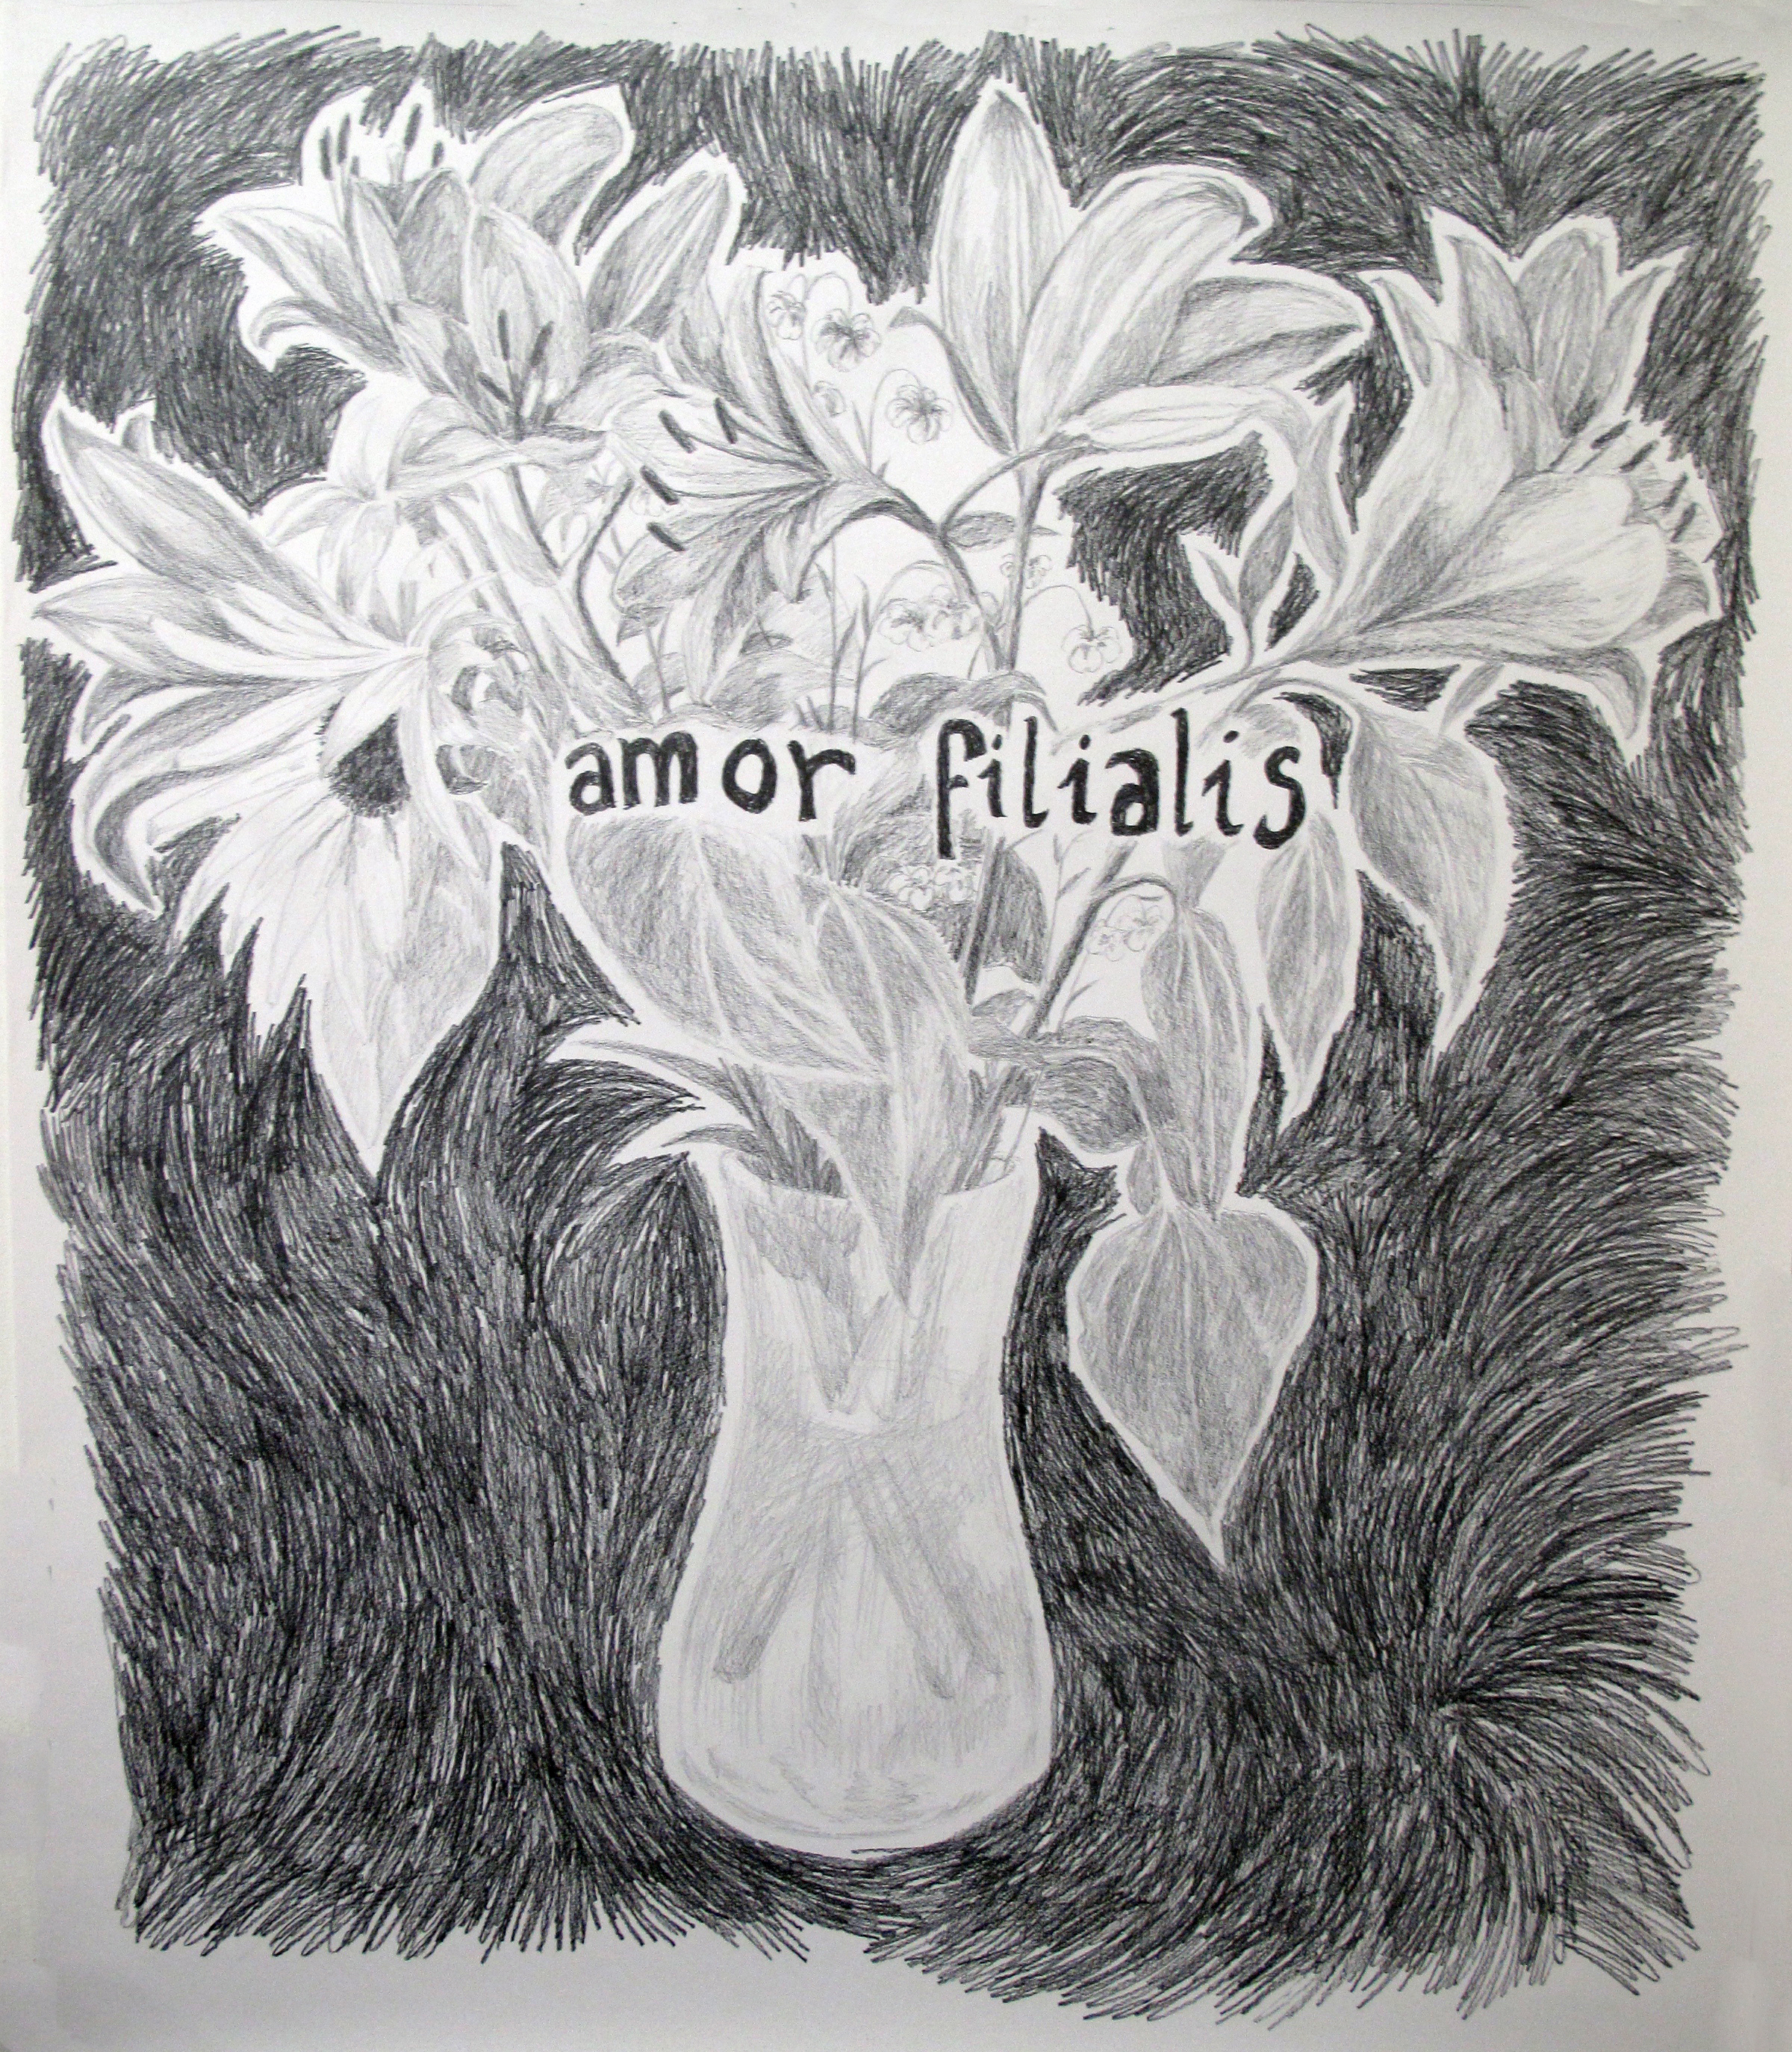 amorfilialis